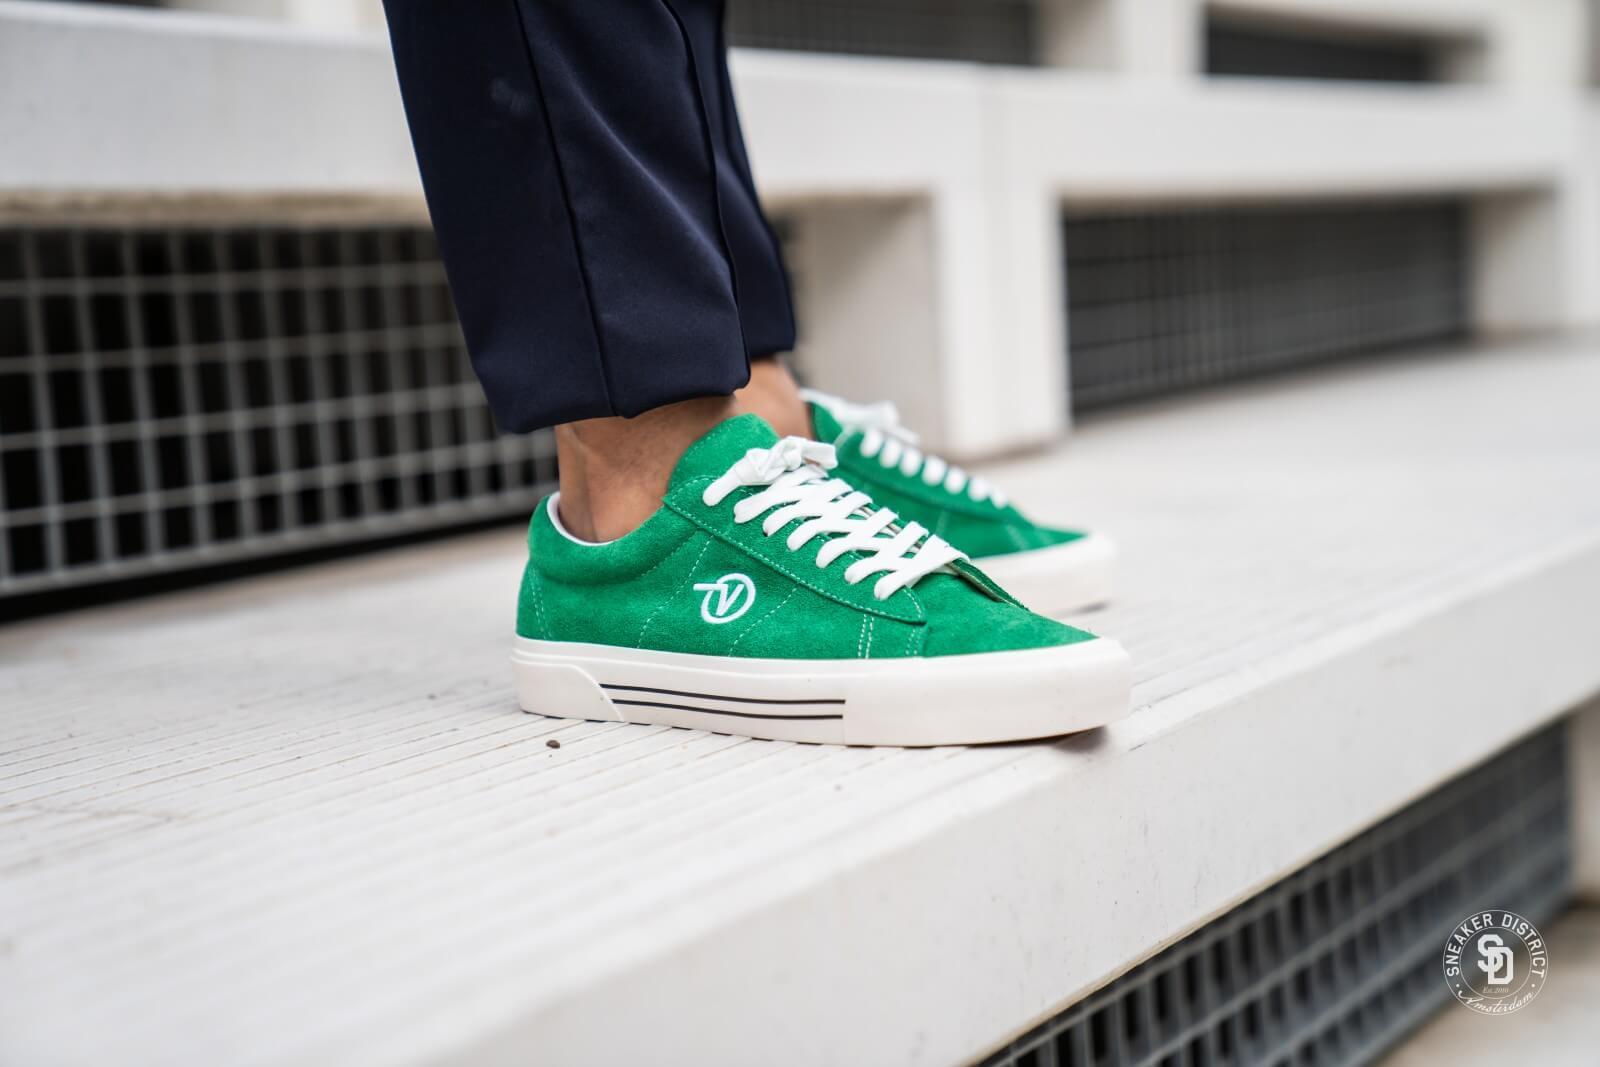 Vans Sid DX Anaheim Factory Emerald